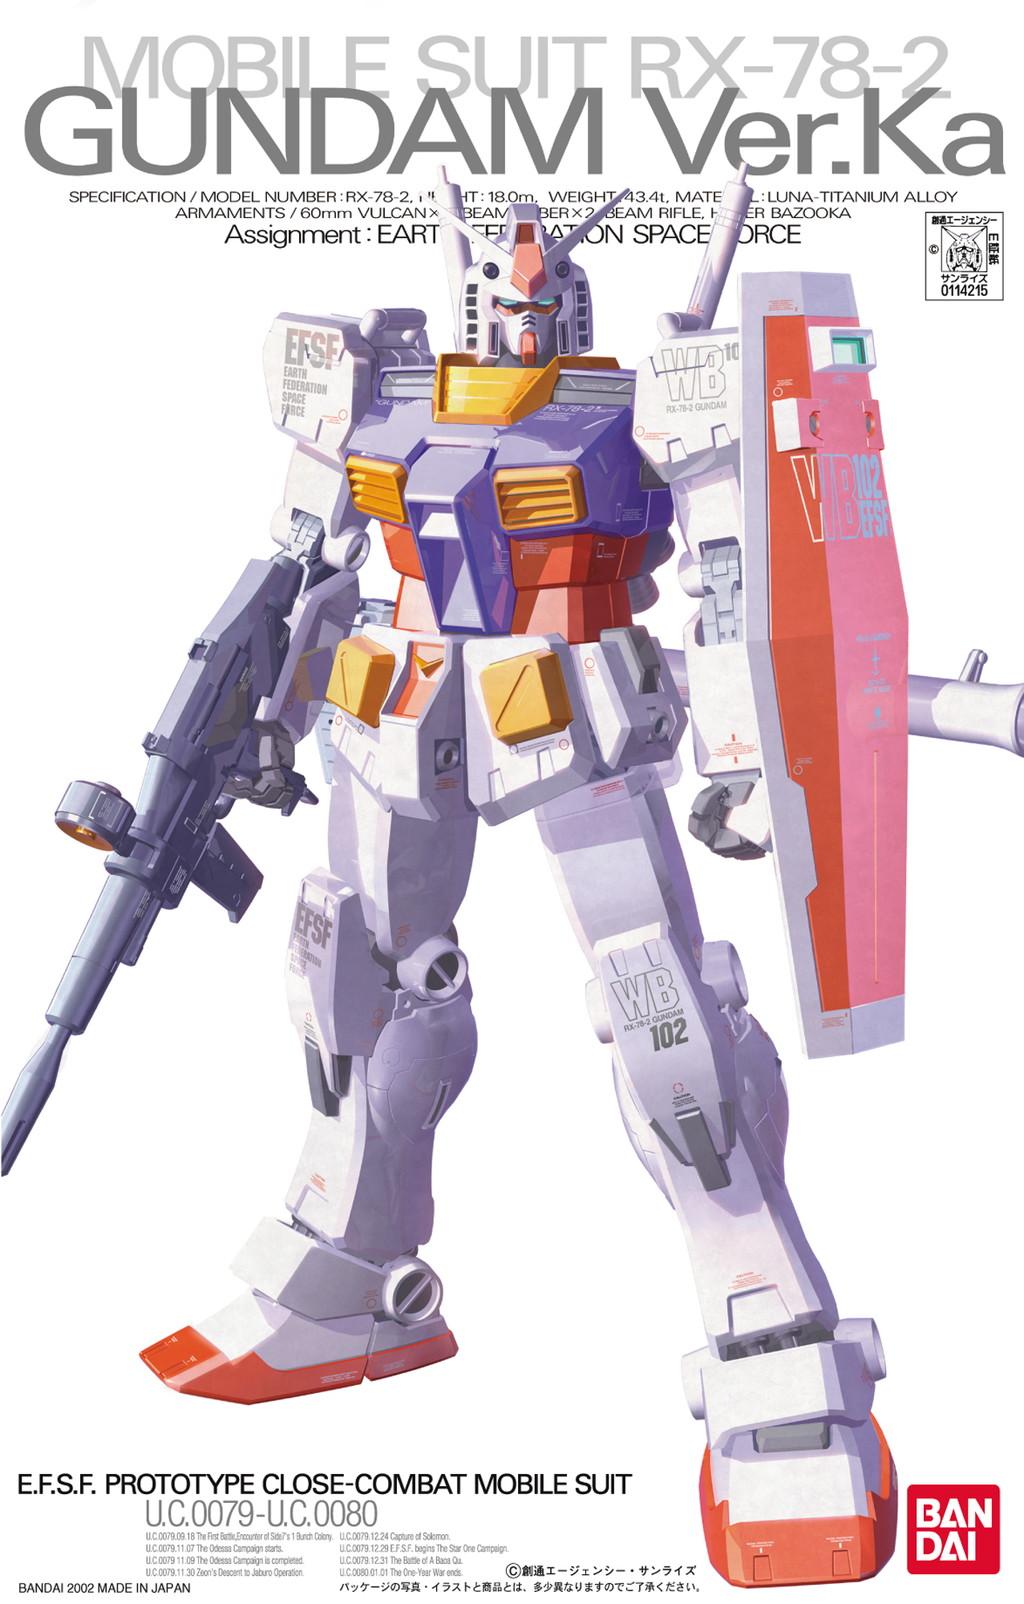 MG 1/100 RX-78-2 ガンダム Ver.Ka [Gundam] 0114215 4543112142153